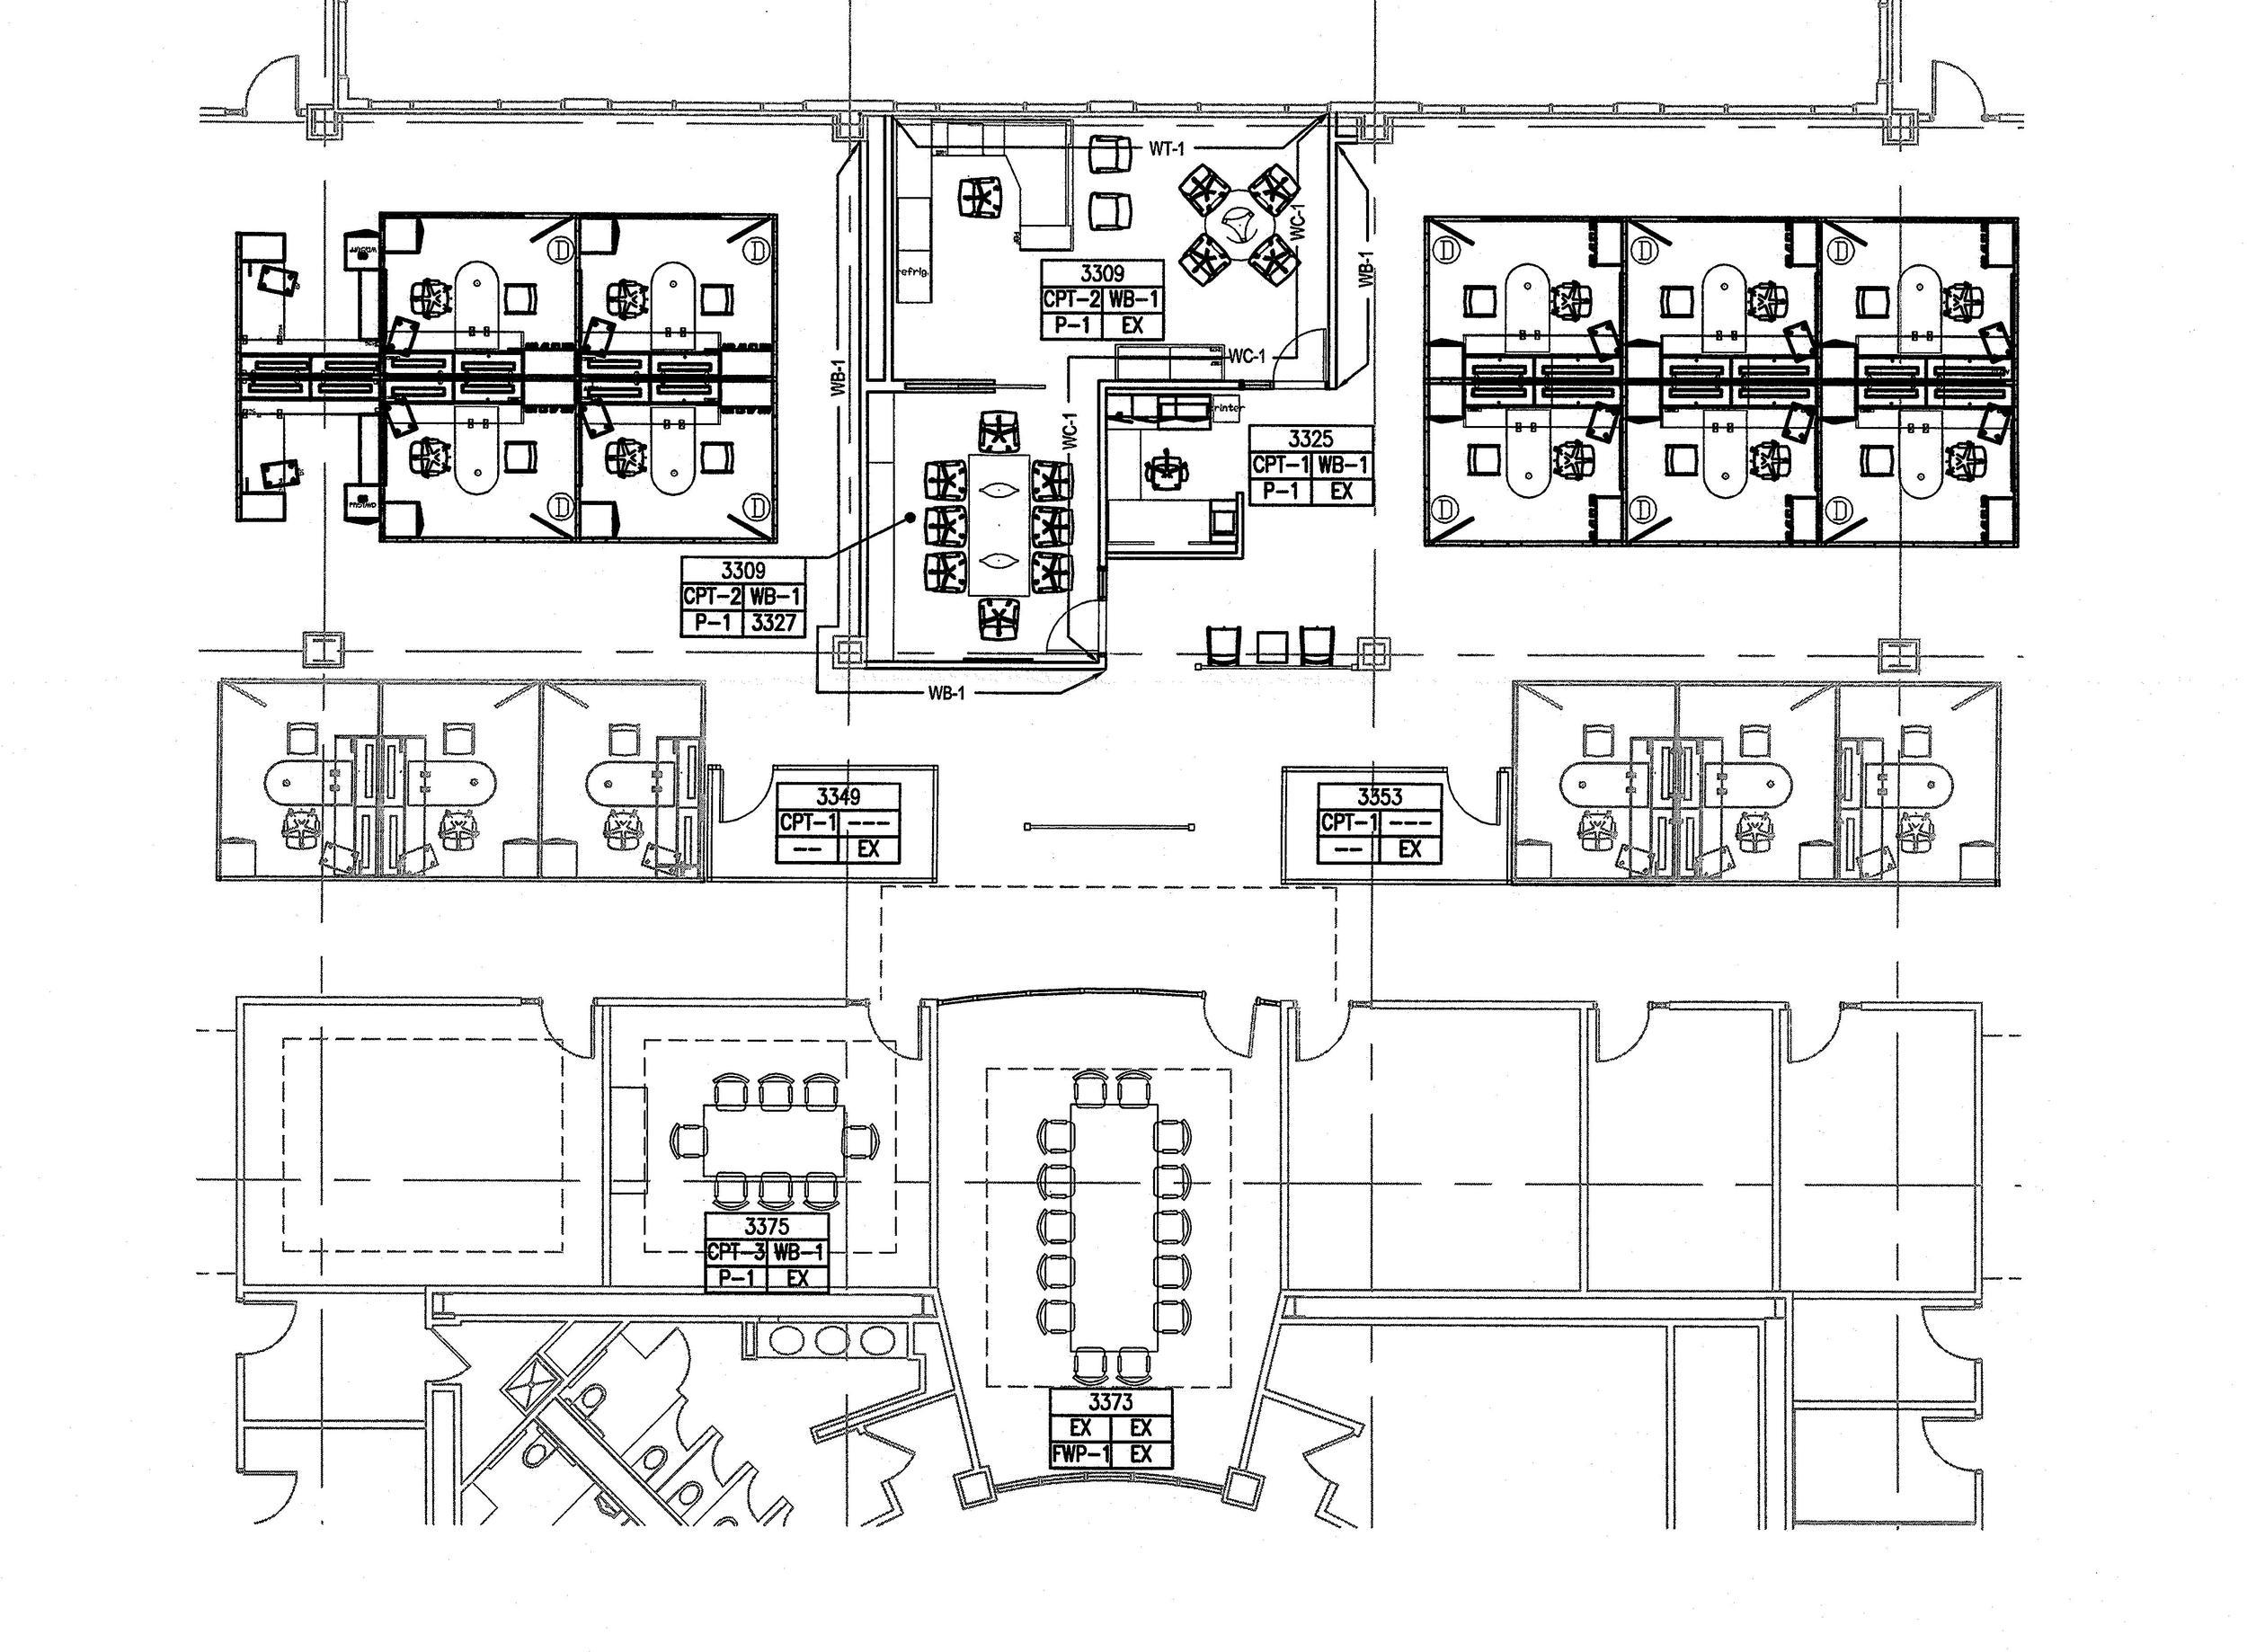 m_projects_0- Old Jobs_Daiichi Sankyo_Daiichi Sankyo 15416_Floor Plan Large.jpg